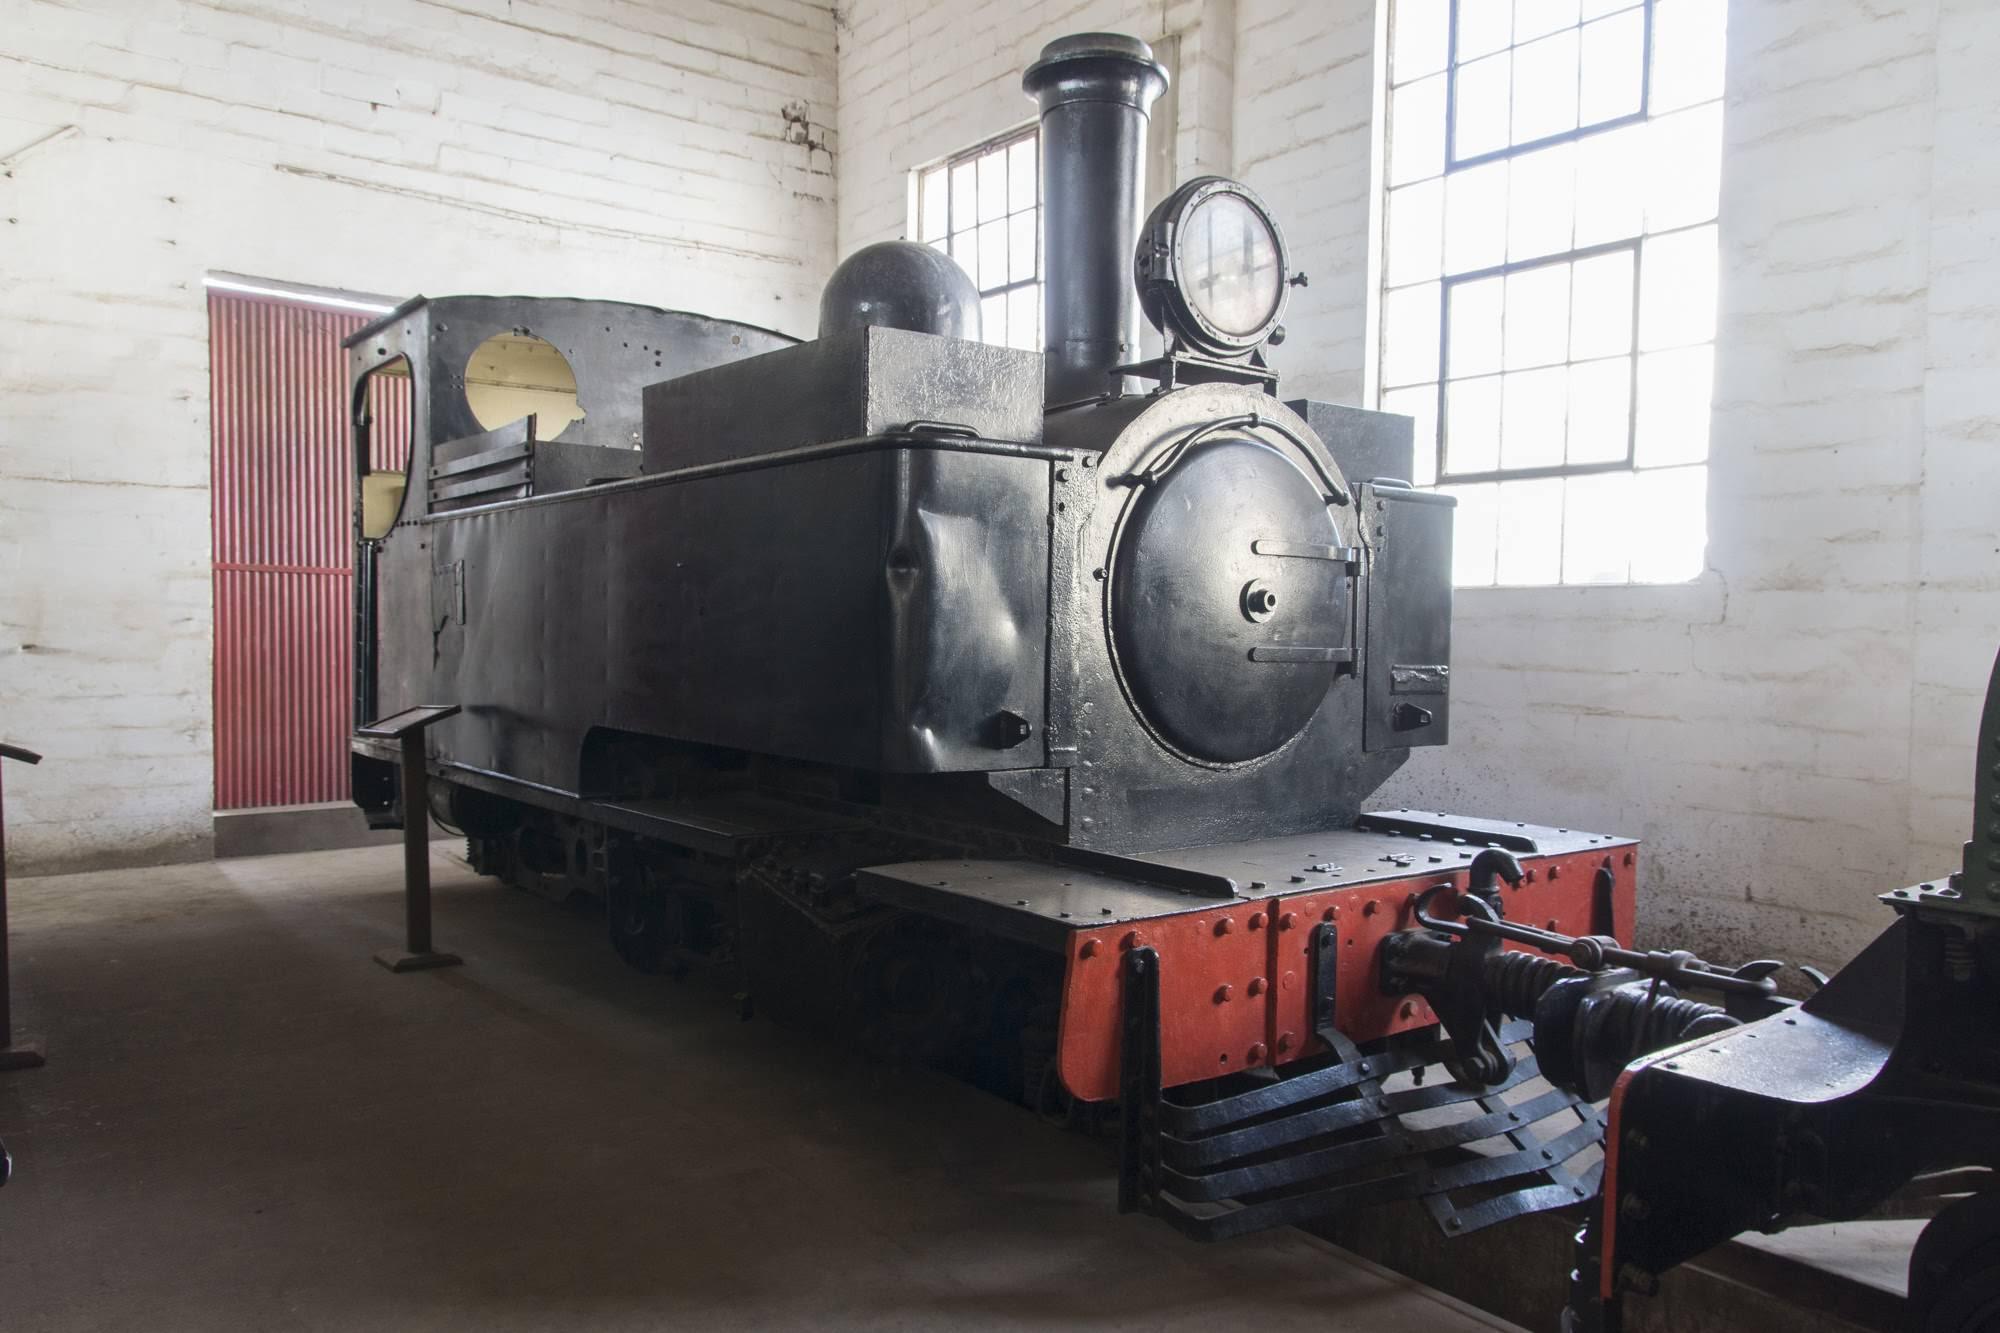 One of the Hunslet locomotives in the Sierra Leone Railway Museum. Credit: William Bickers-Jones.